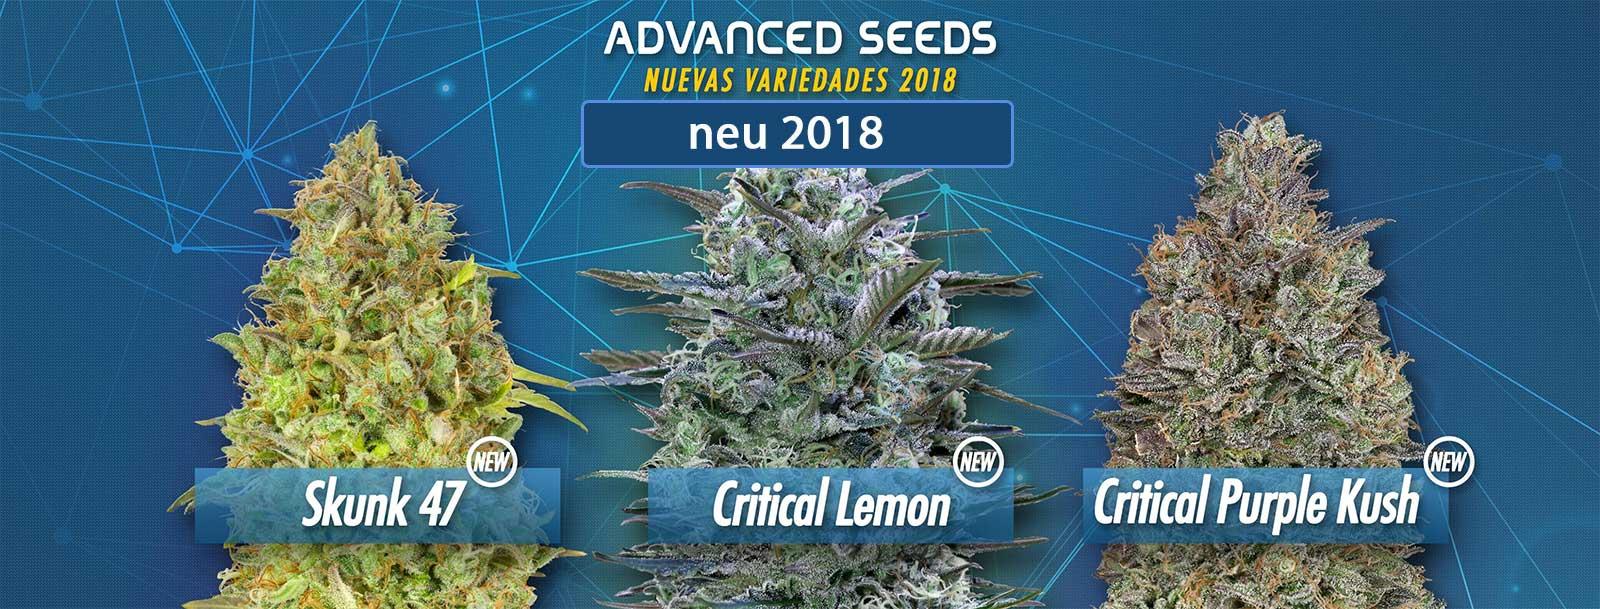 Neu-Advanced-Seeds